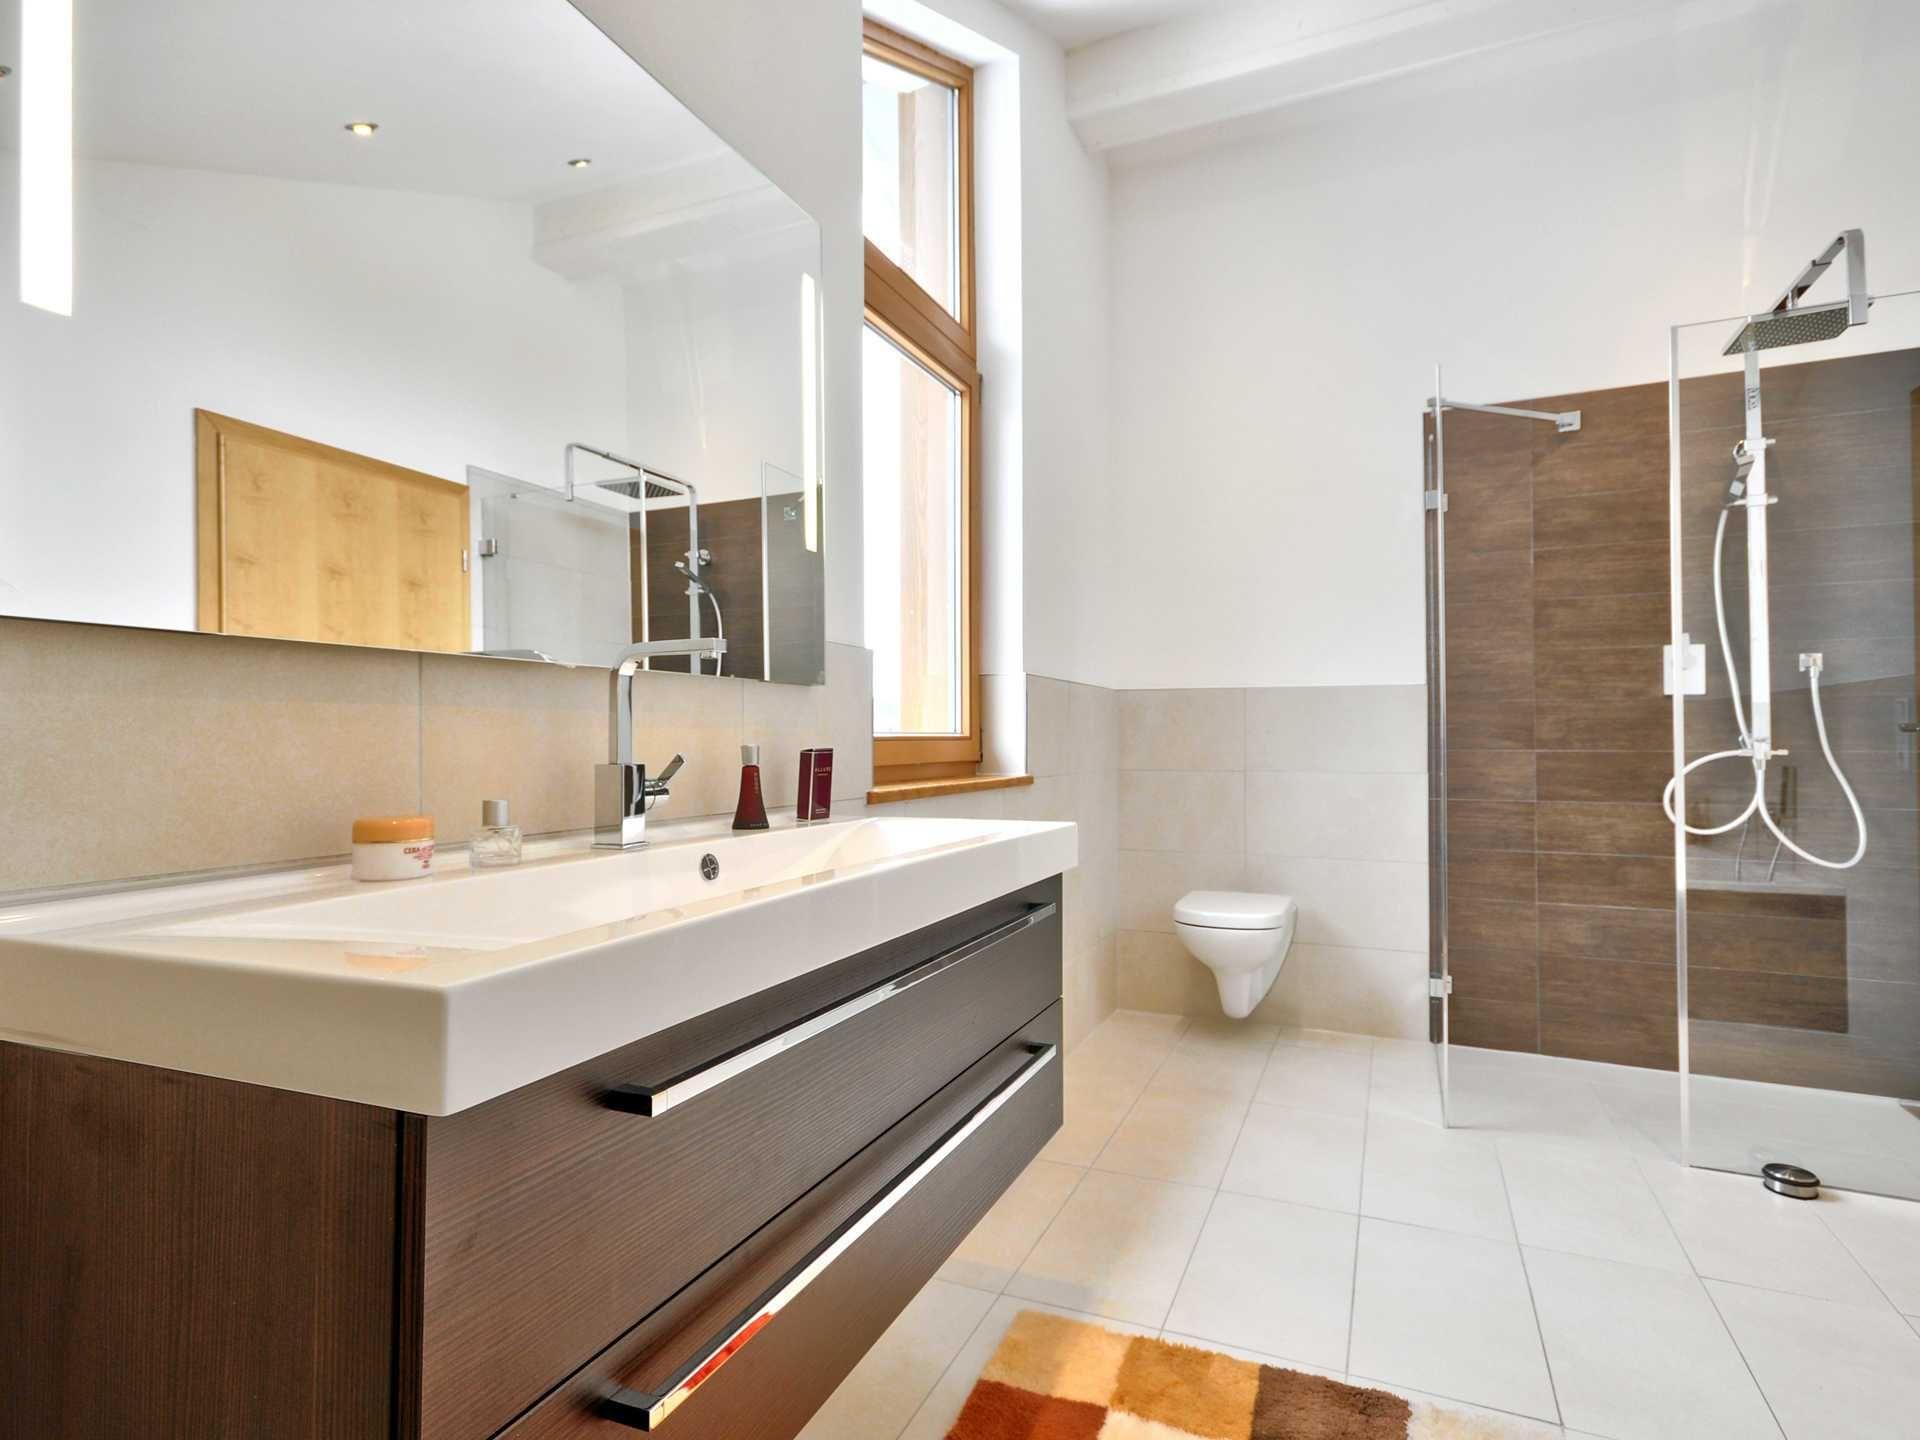 Poing Albert Haus In 2020 Musterhaus Badezimmer Und Haus